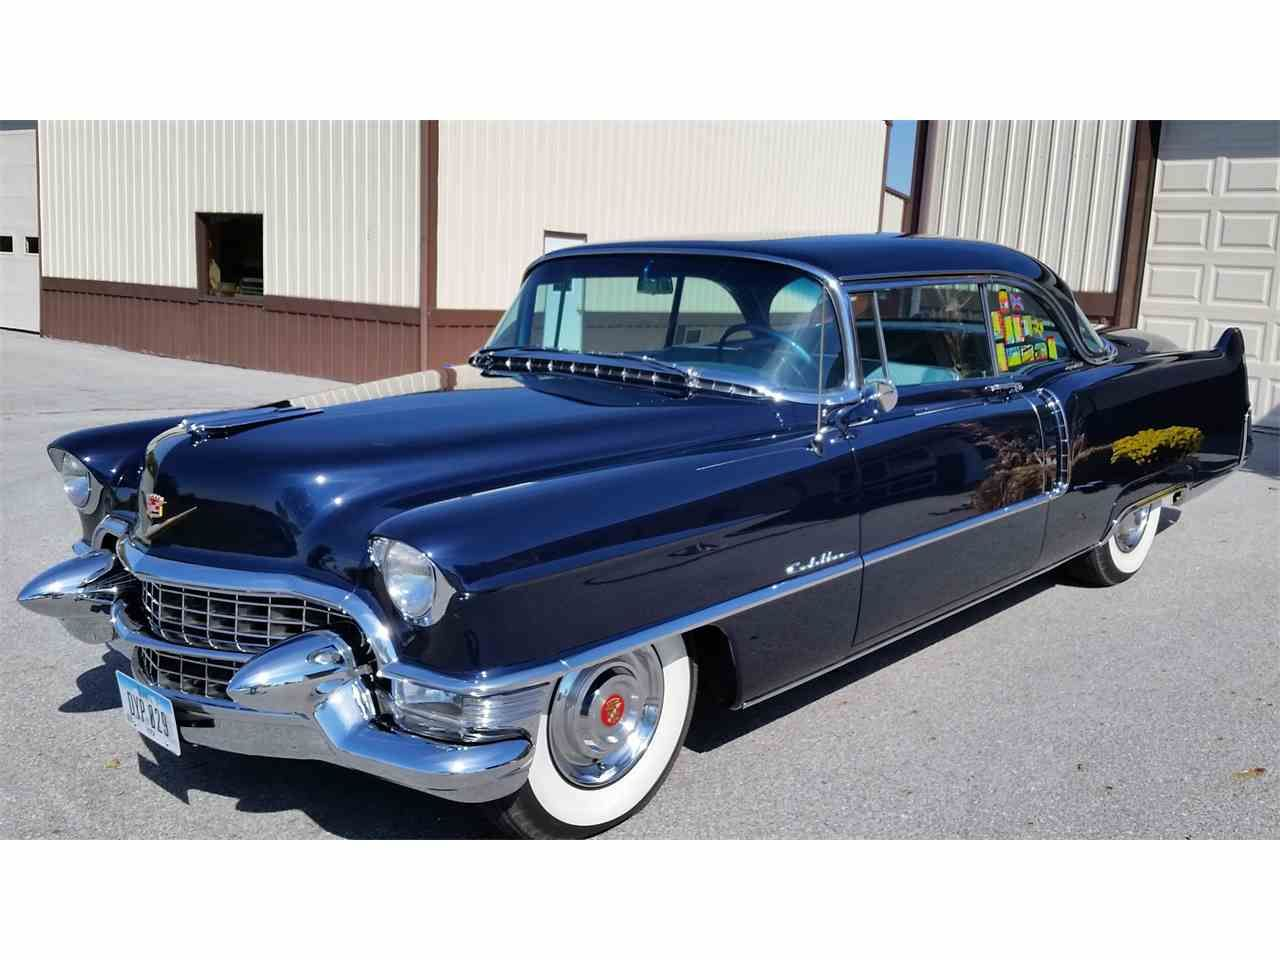 1955 Cadillac Coupe Deville for Sale | 1955 Cadillac Coupe DeVille ...